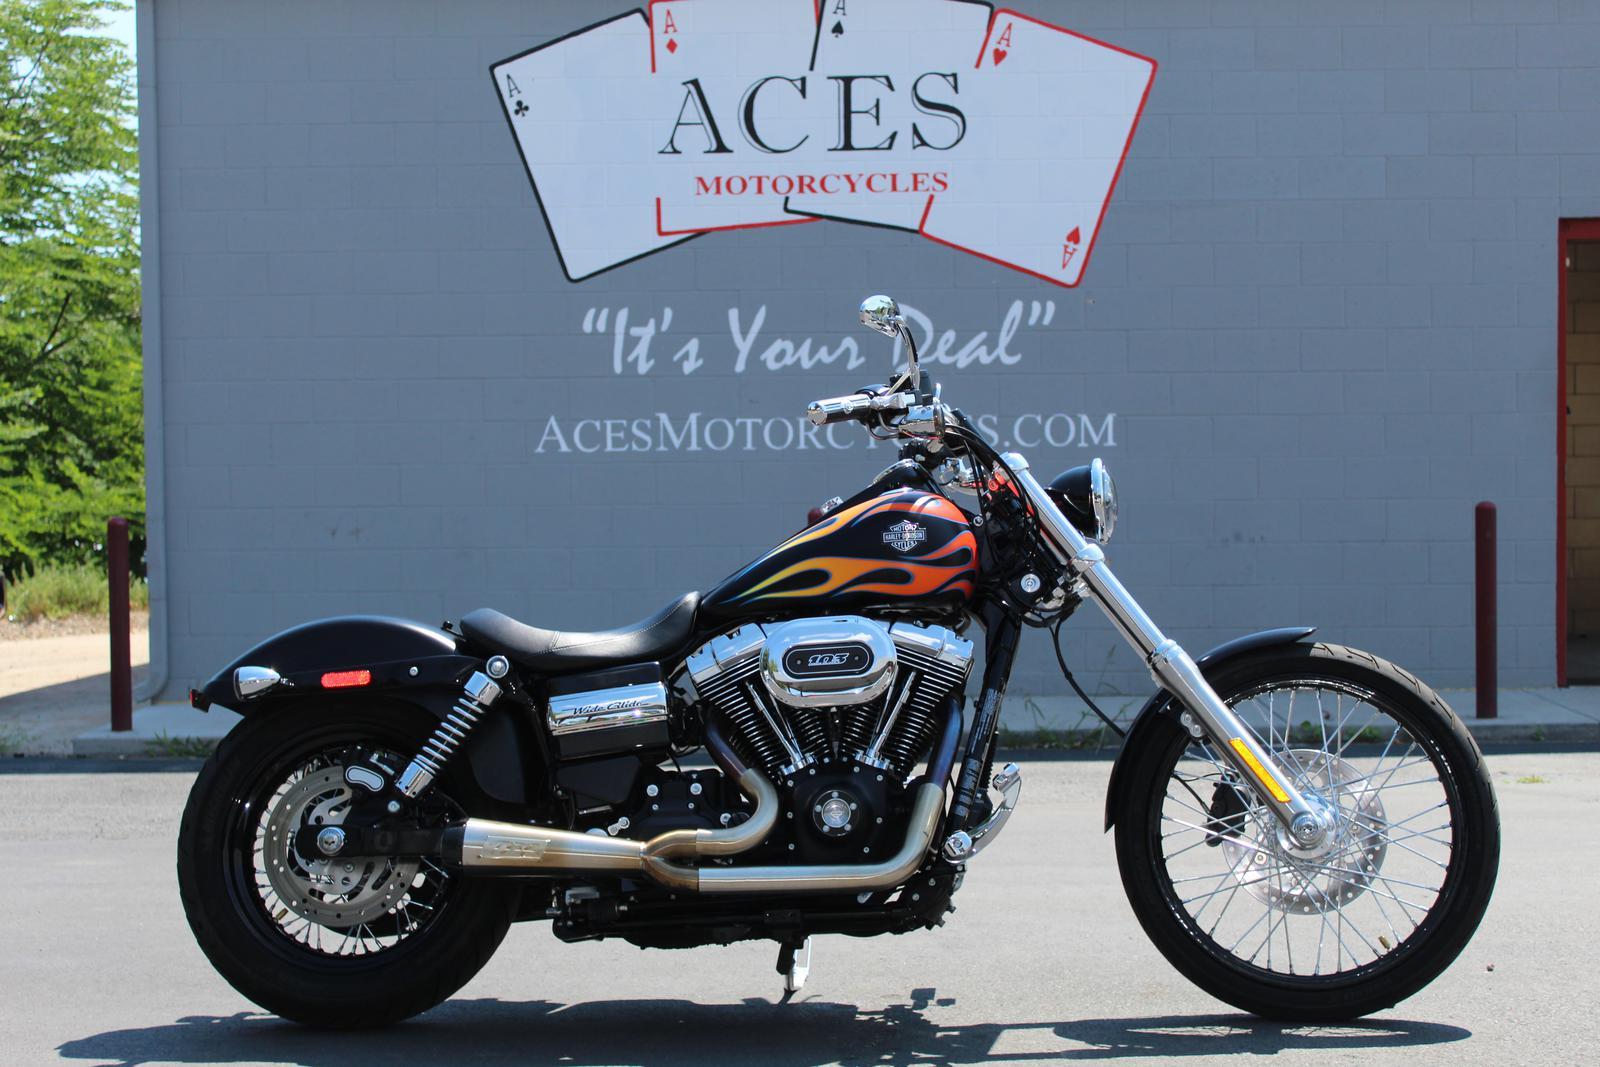 2017 Harley-Davidson® Dyna Wide Glide